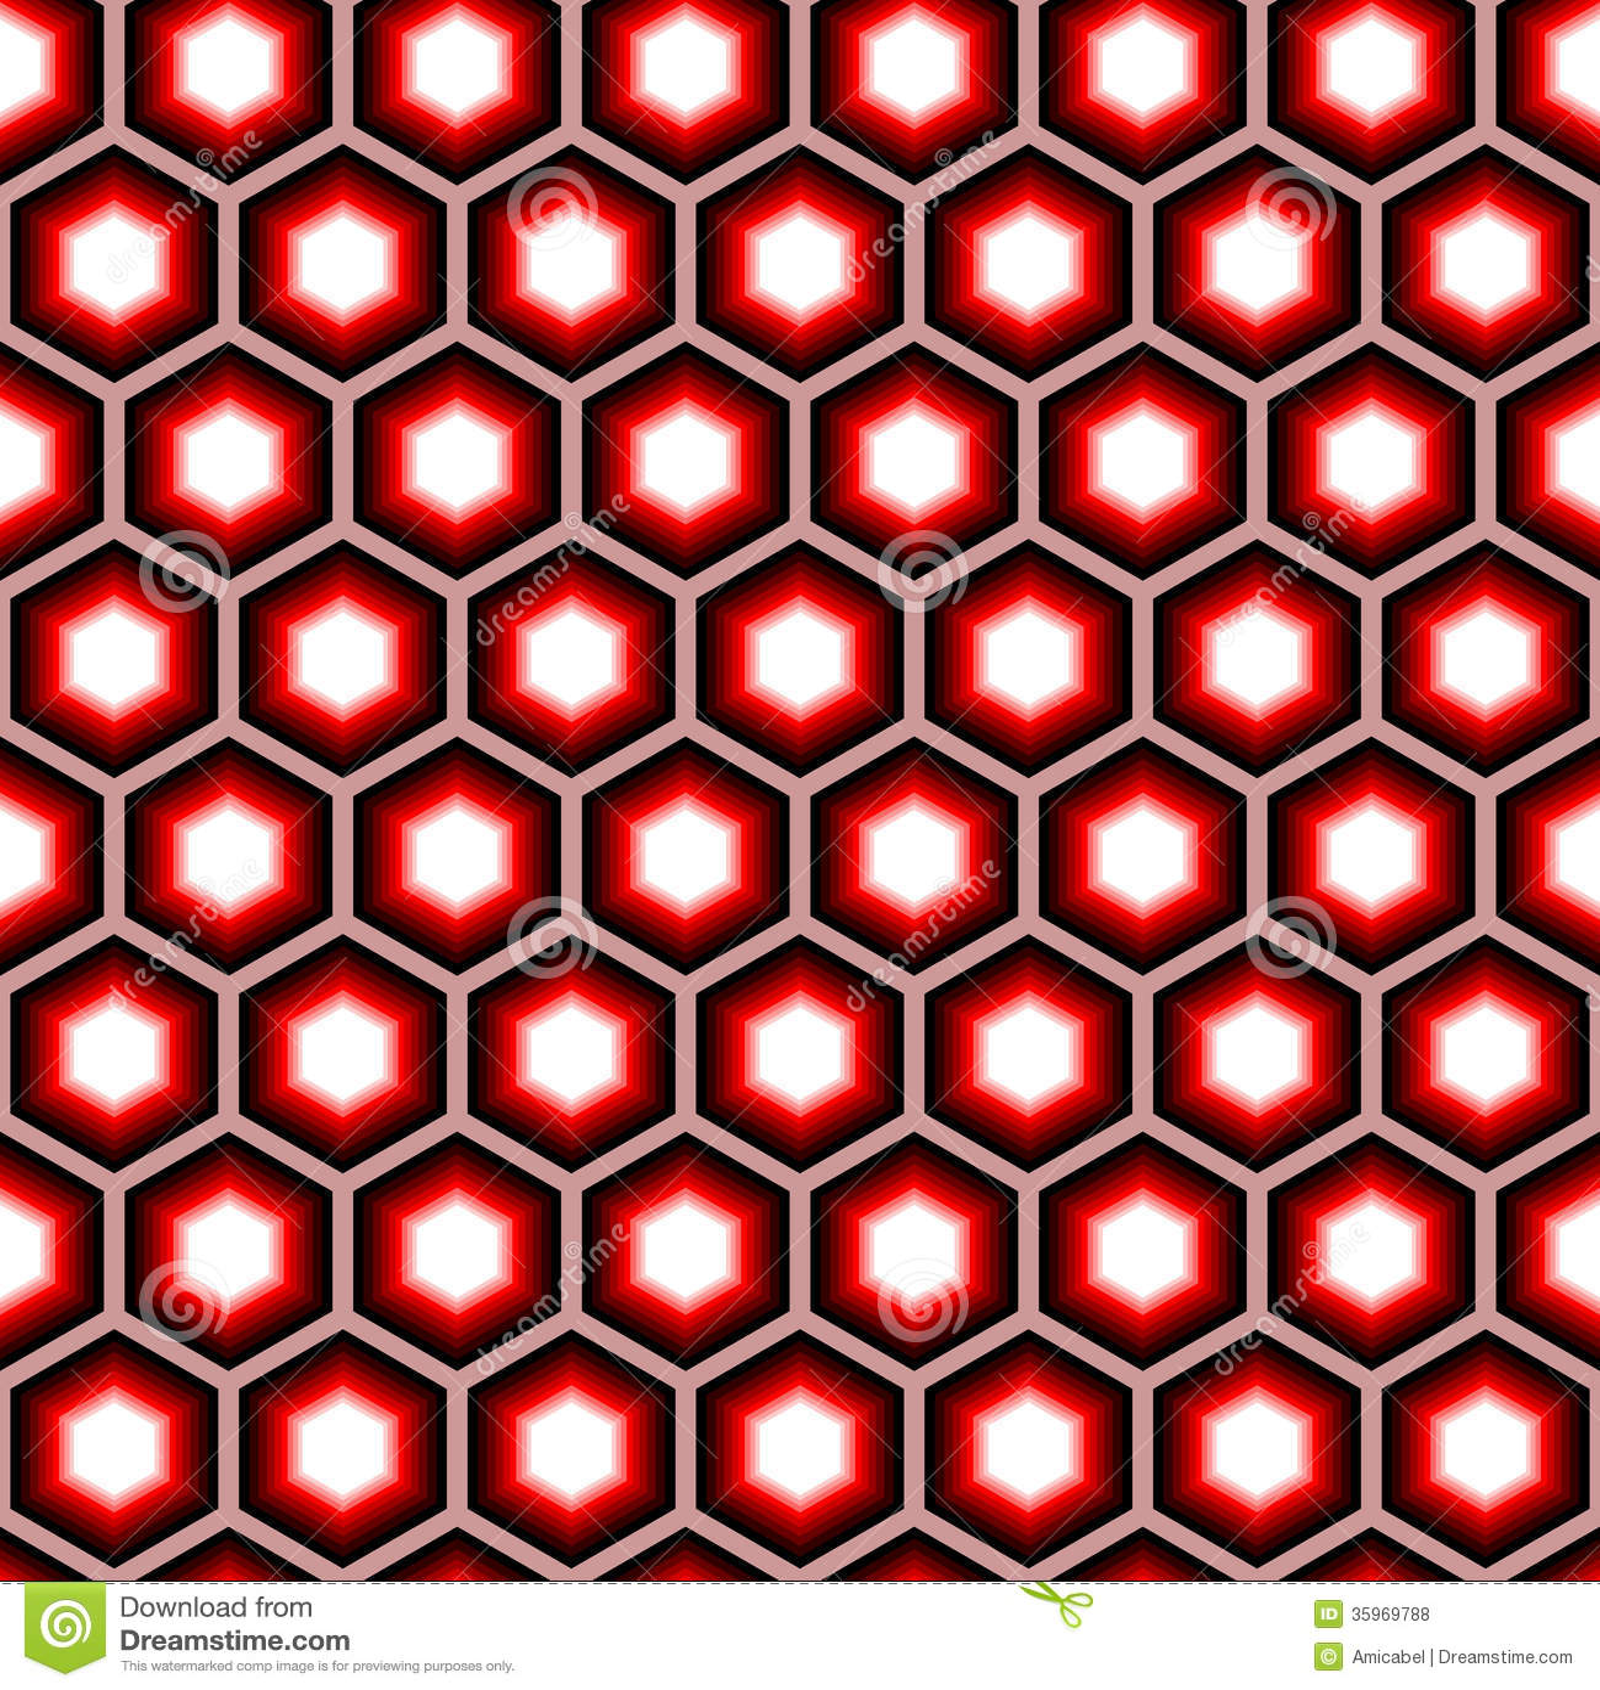 Modelo geométrico del hexágono inconsútil del diseño. Colorfu